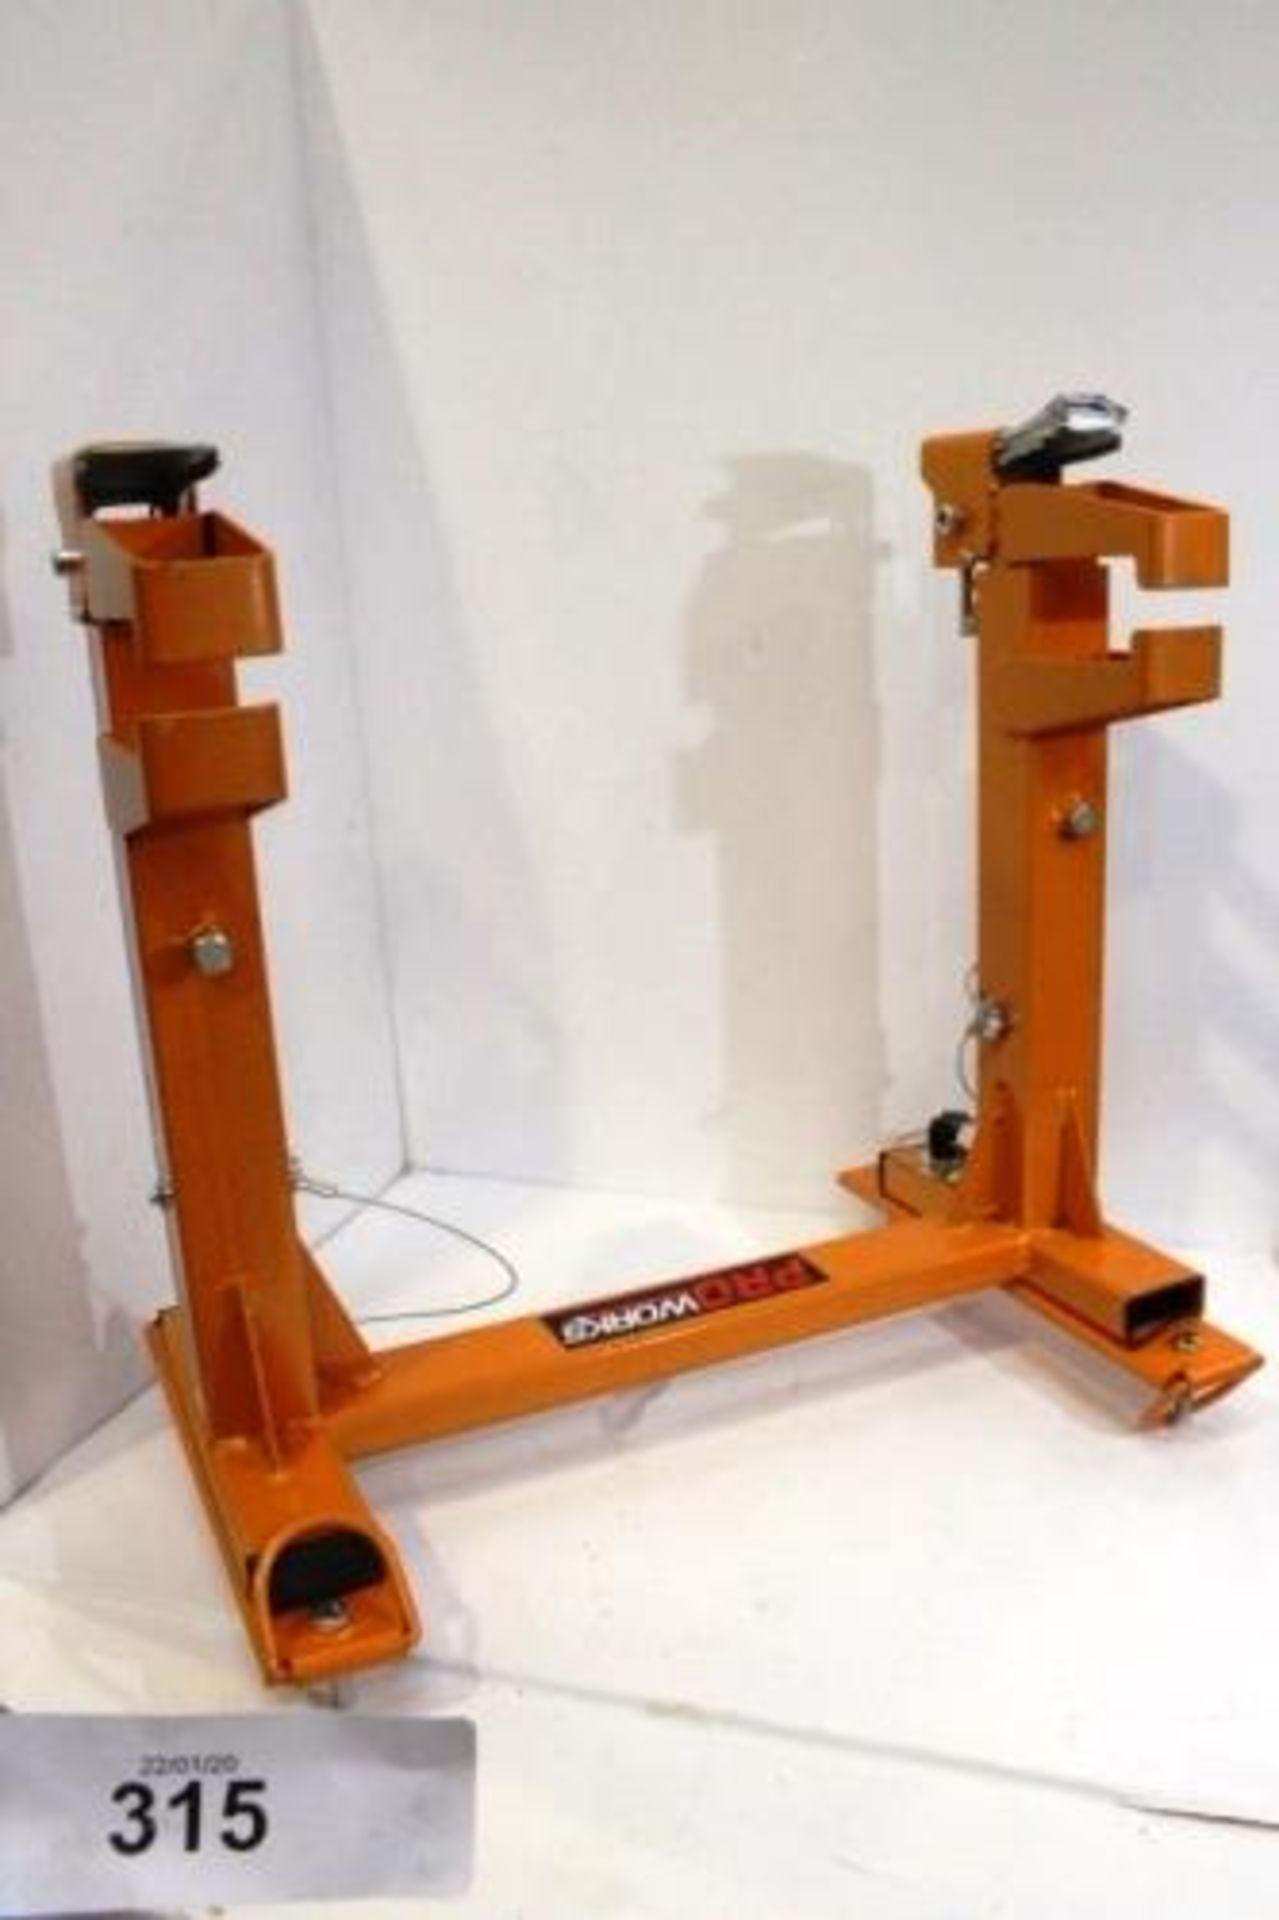 Lot 315 - 1 x Proworks orange quick release motorbike transport bracket - New (GS7end)